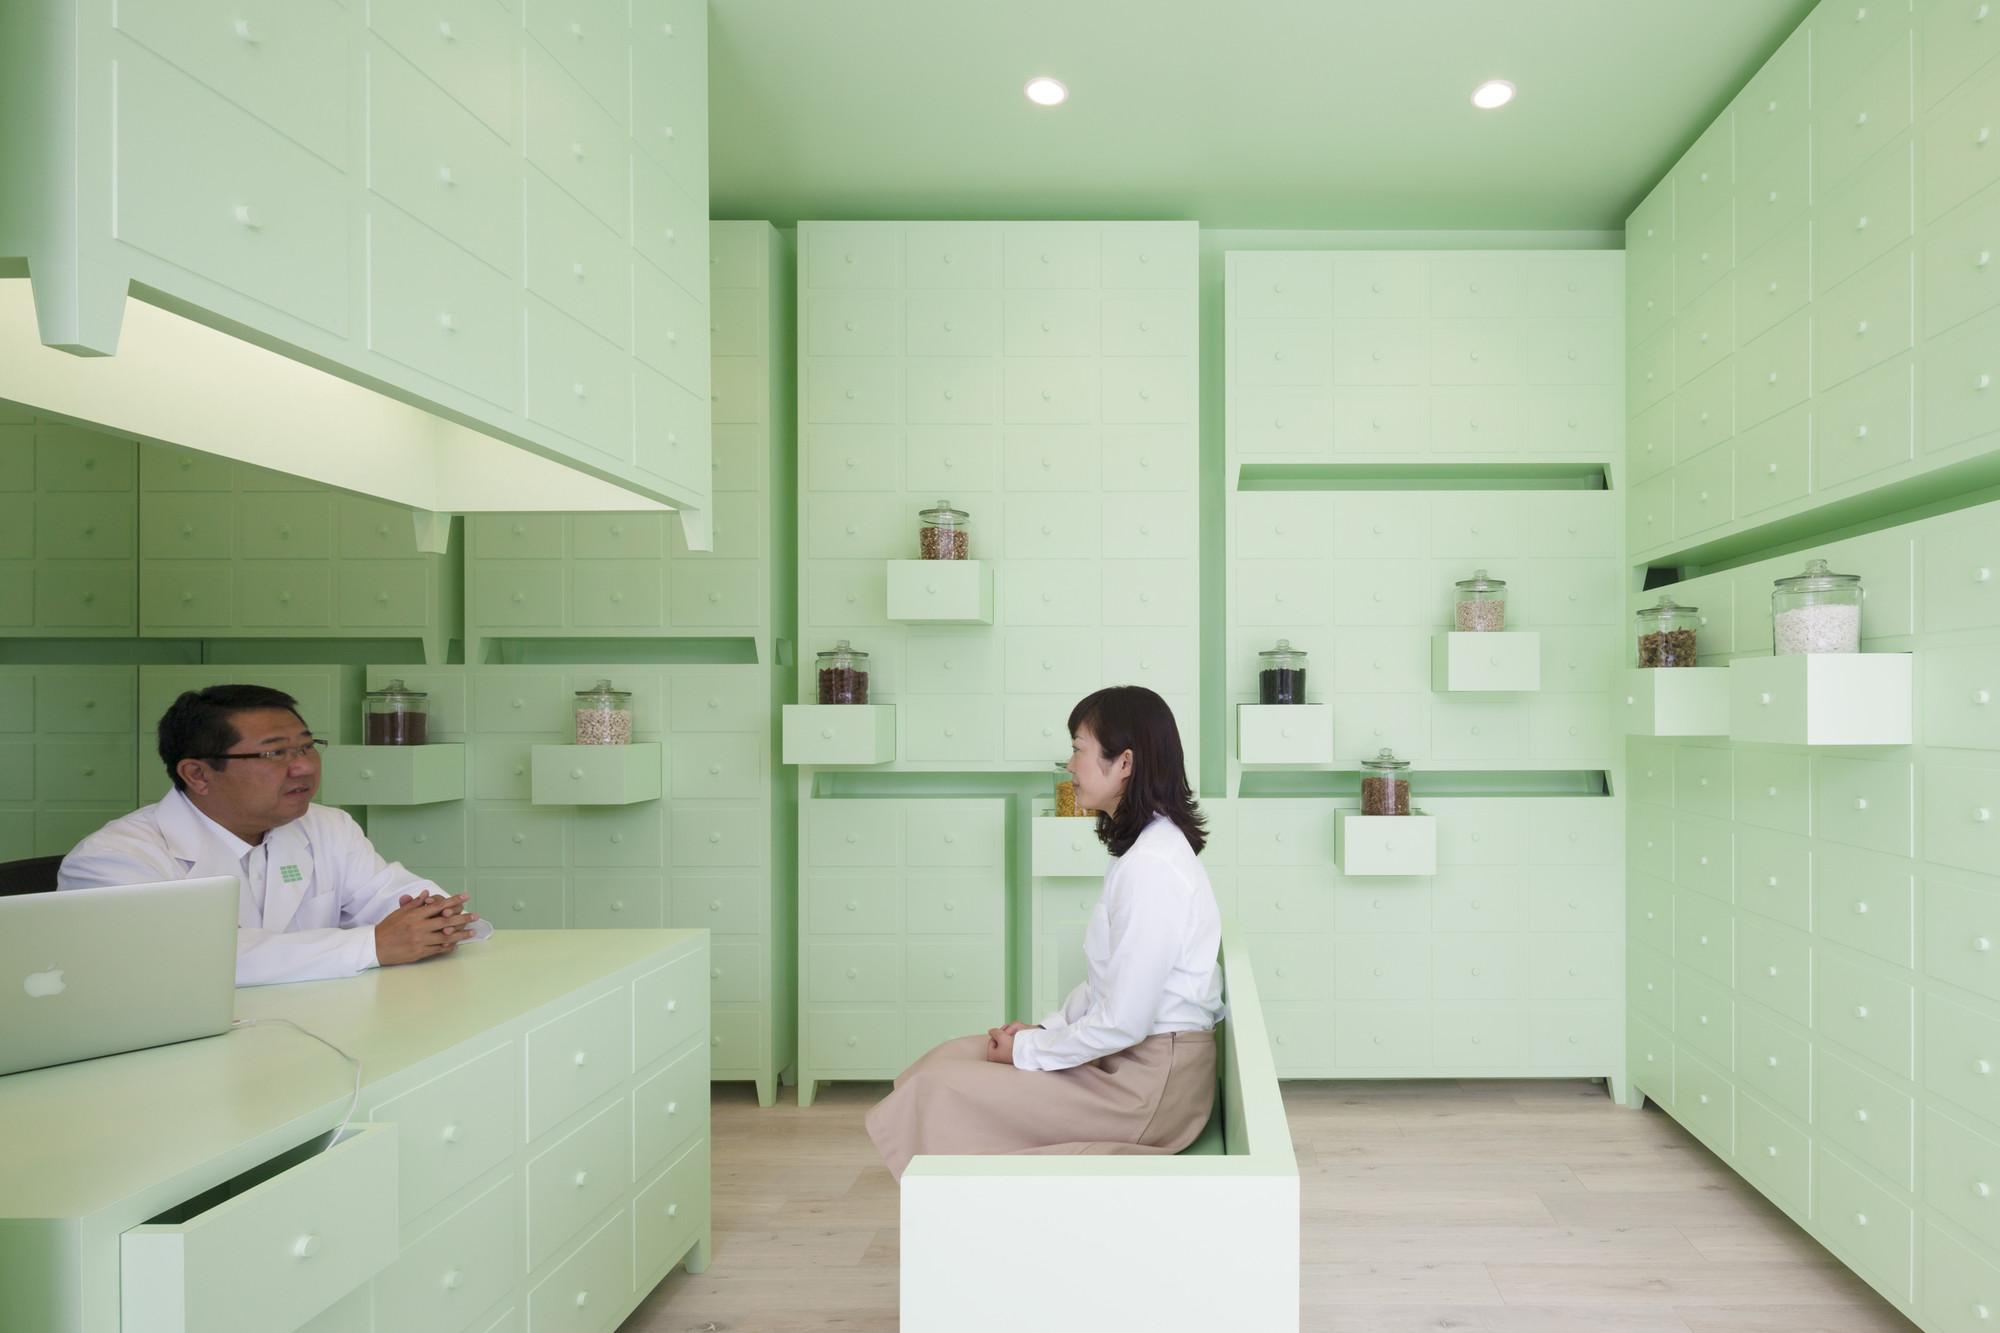 SUMIYOSHIDO kampo lounge / id inc., Courtesy of © id inc.